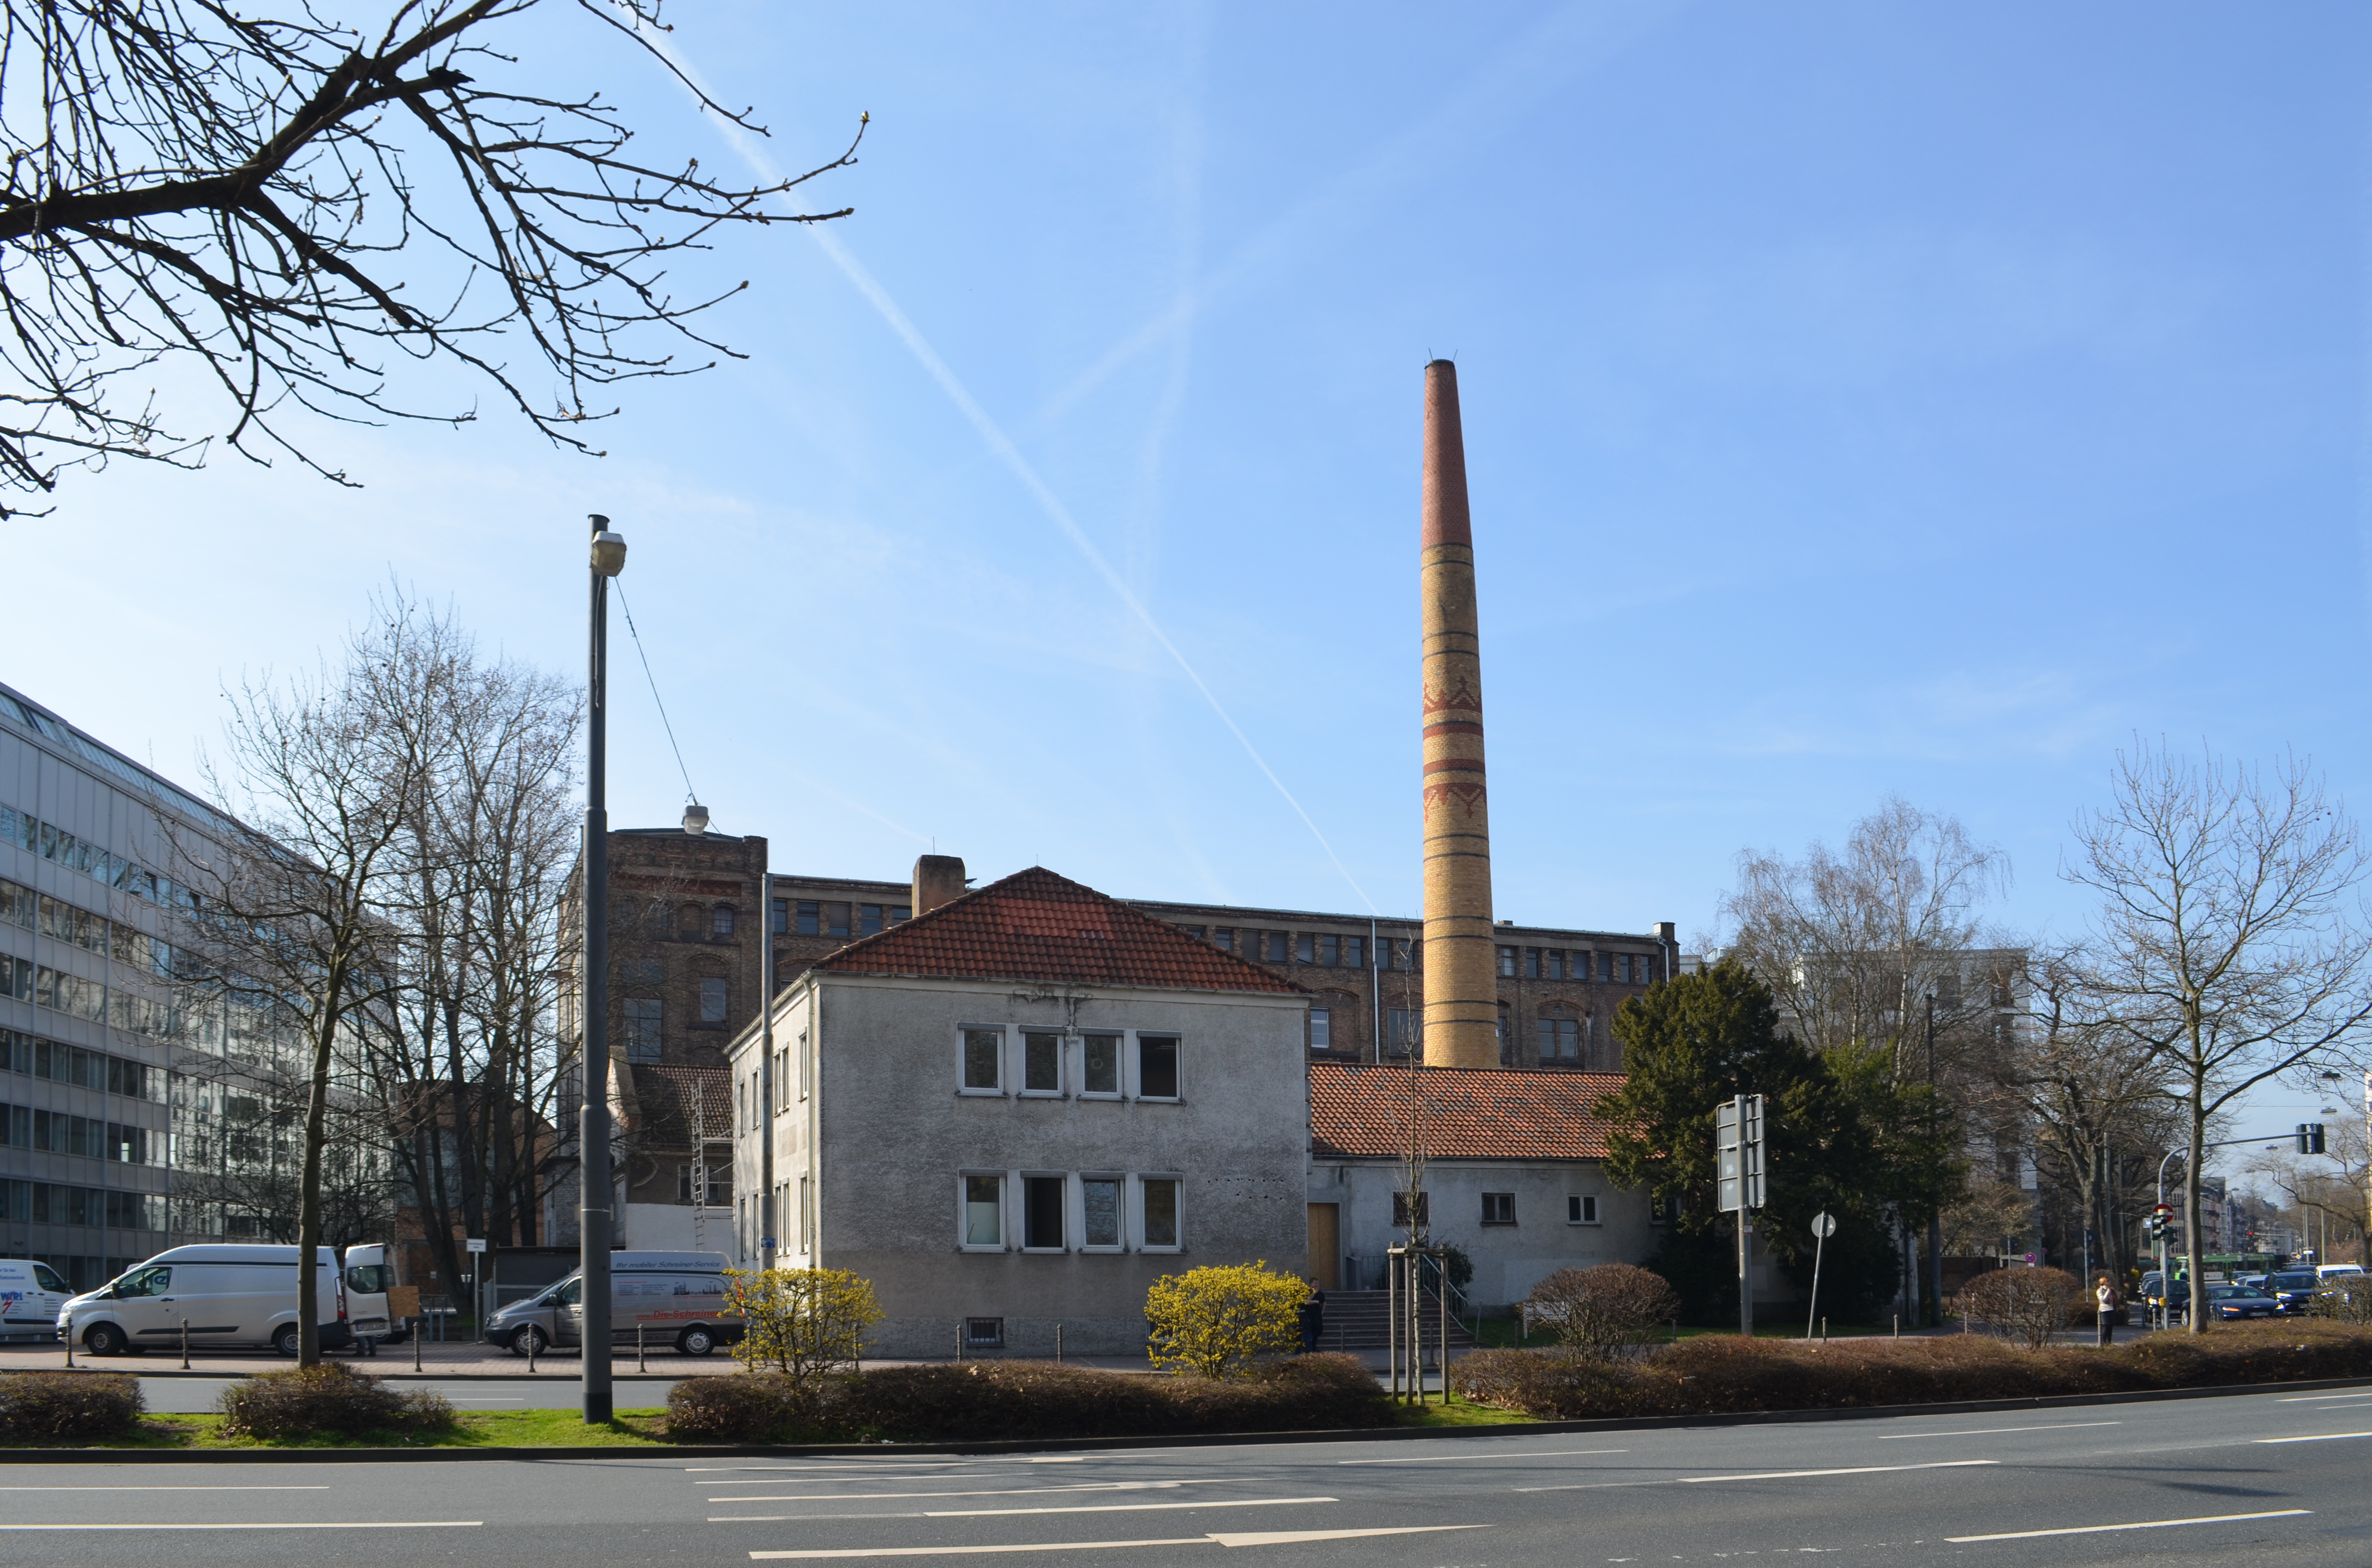 Druckerei In Frankfurt Am Main Druckerei In Frankfurt Am